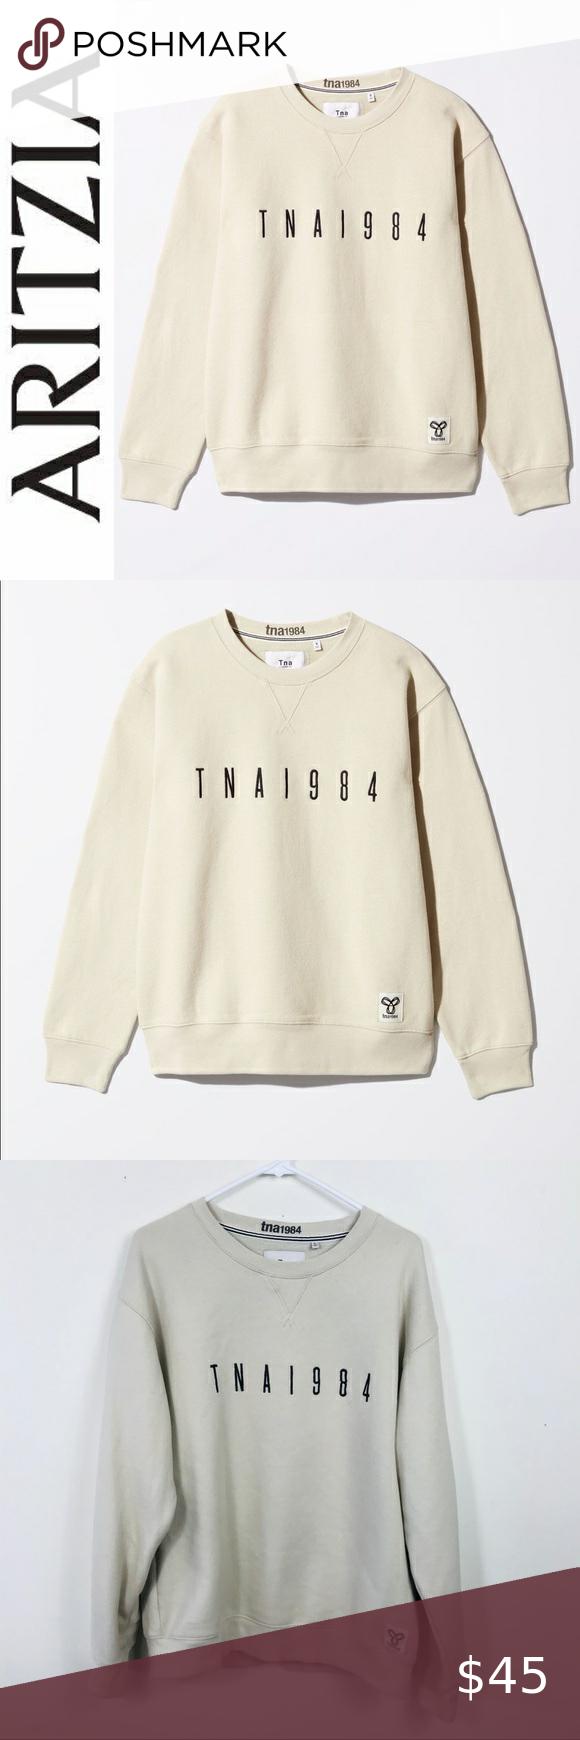 Aritzia Tna 1984 Avalanche Cream Crew Sweatshirt L Sweatshirts Crew Sweatshirts Sweatshirt Tops [ 1740 x 580 Pixel ]